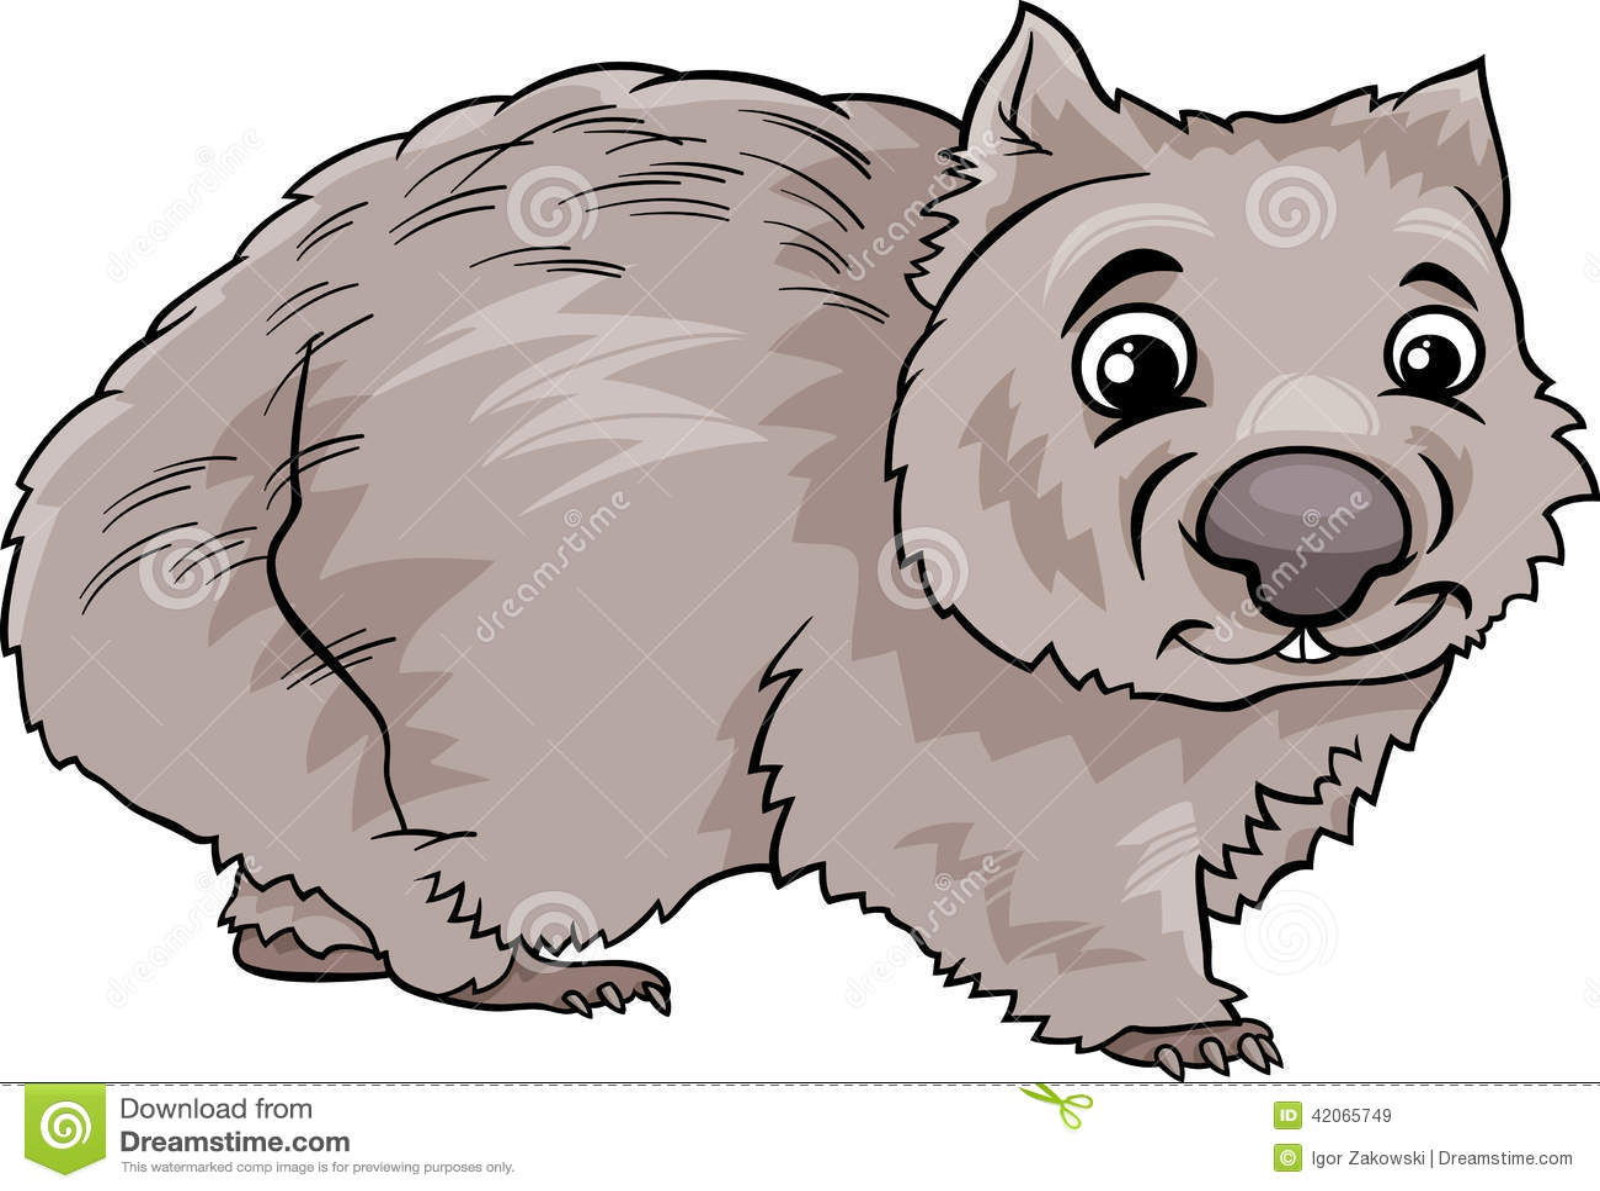 Wombat Animal Cartoon Illustration Stock Vector Image